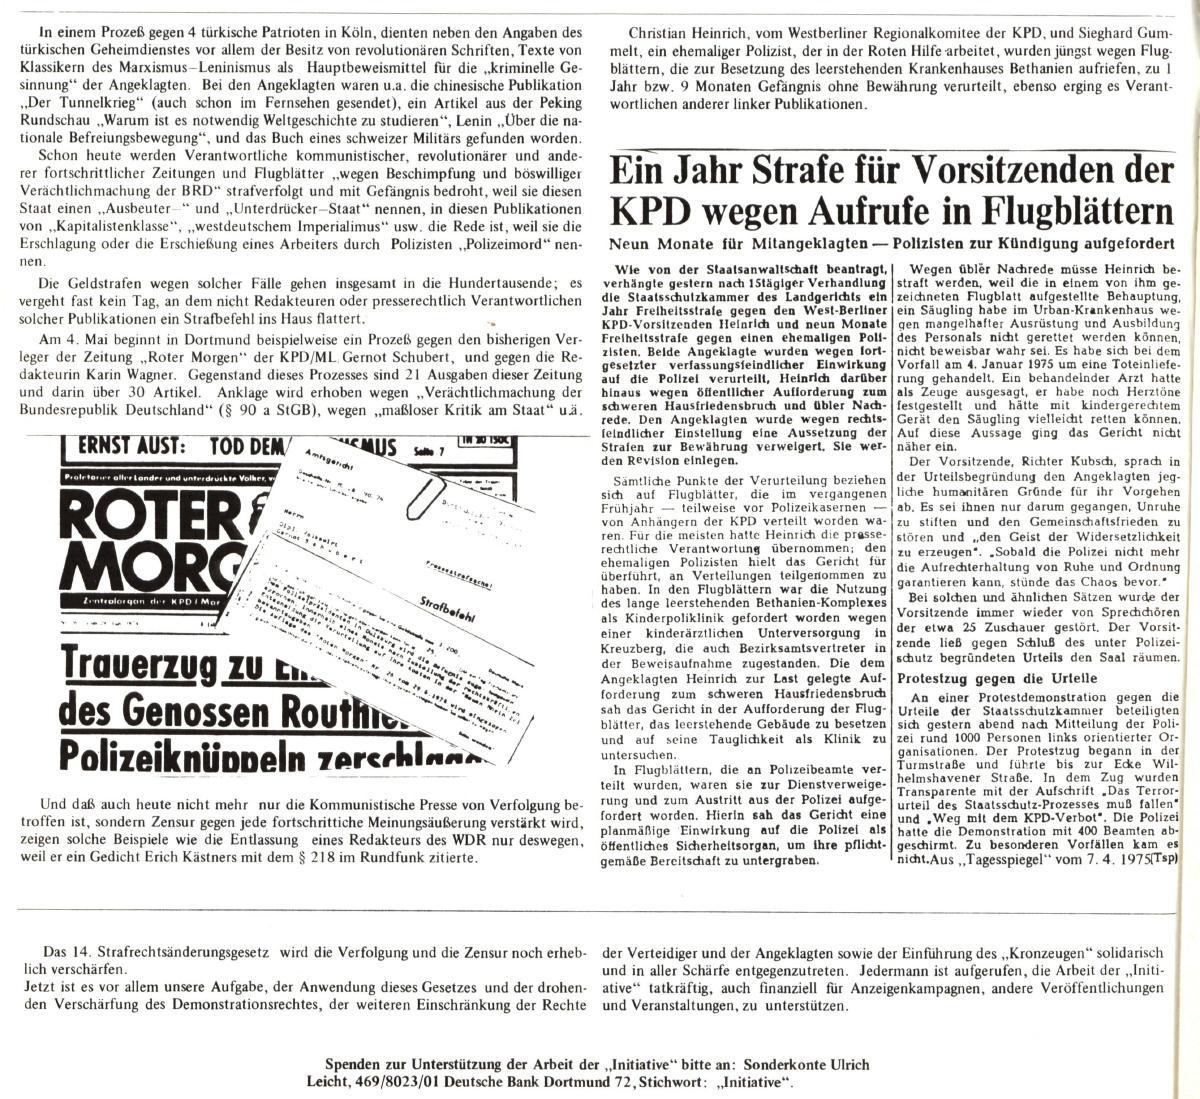 REP_VLB_1976_Die_Zensurgesetze_13